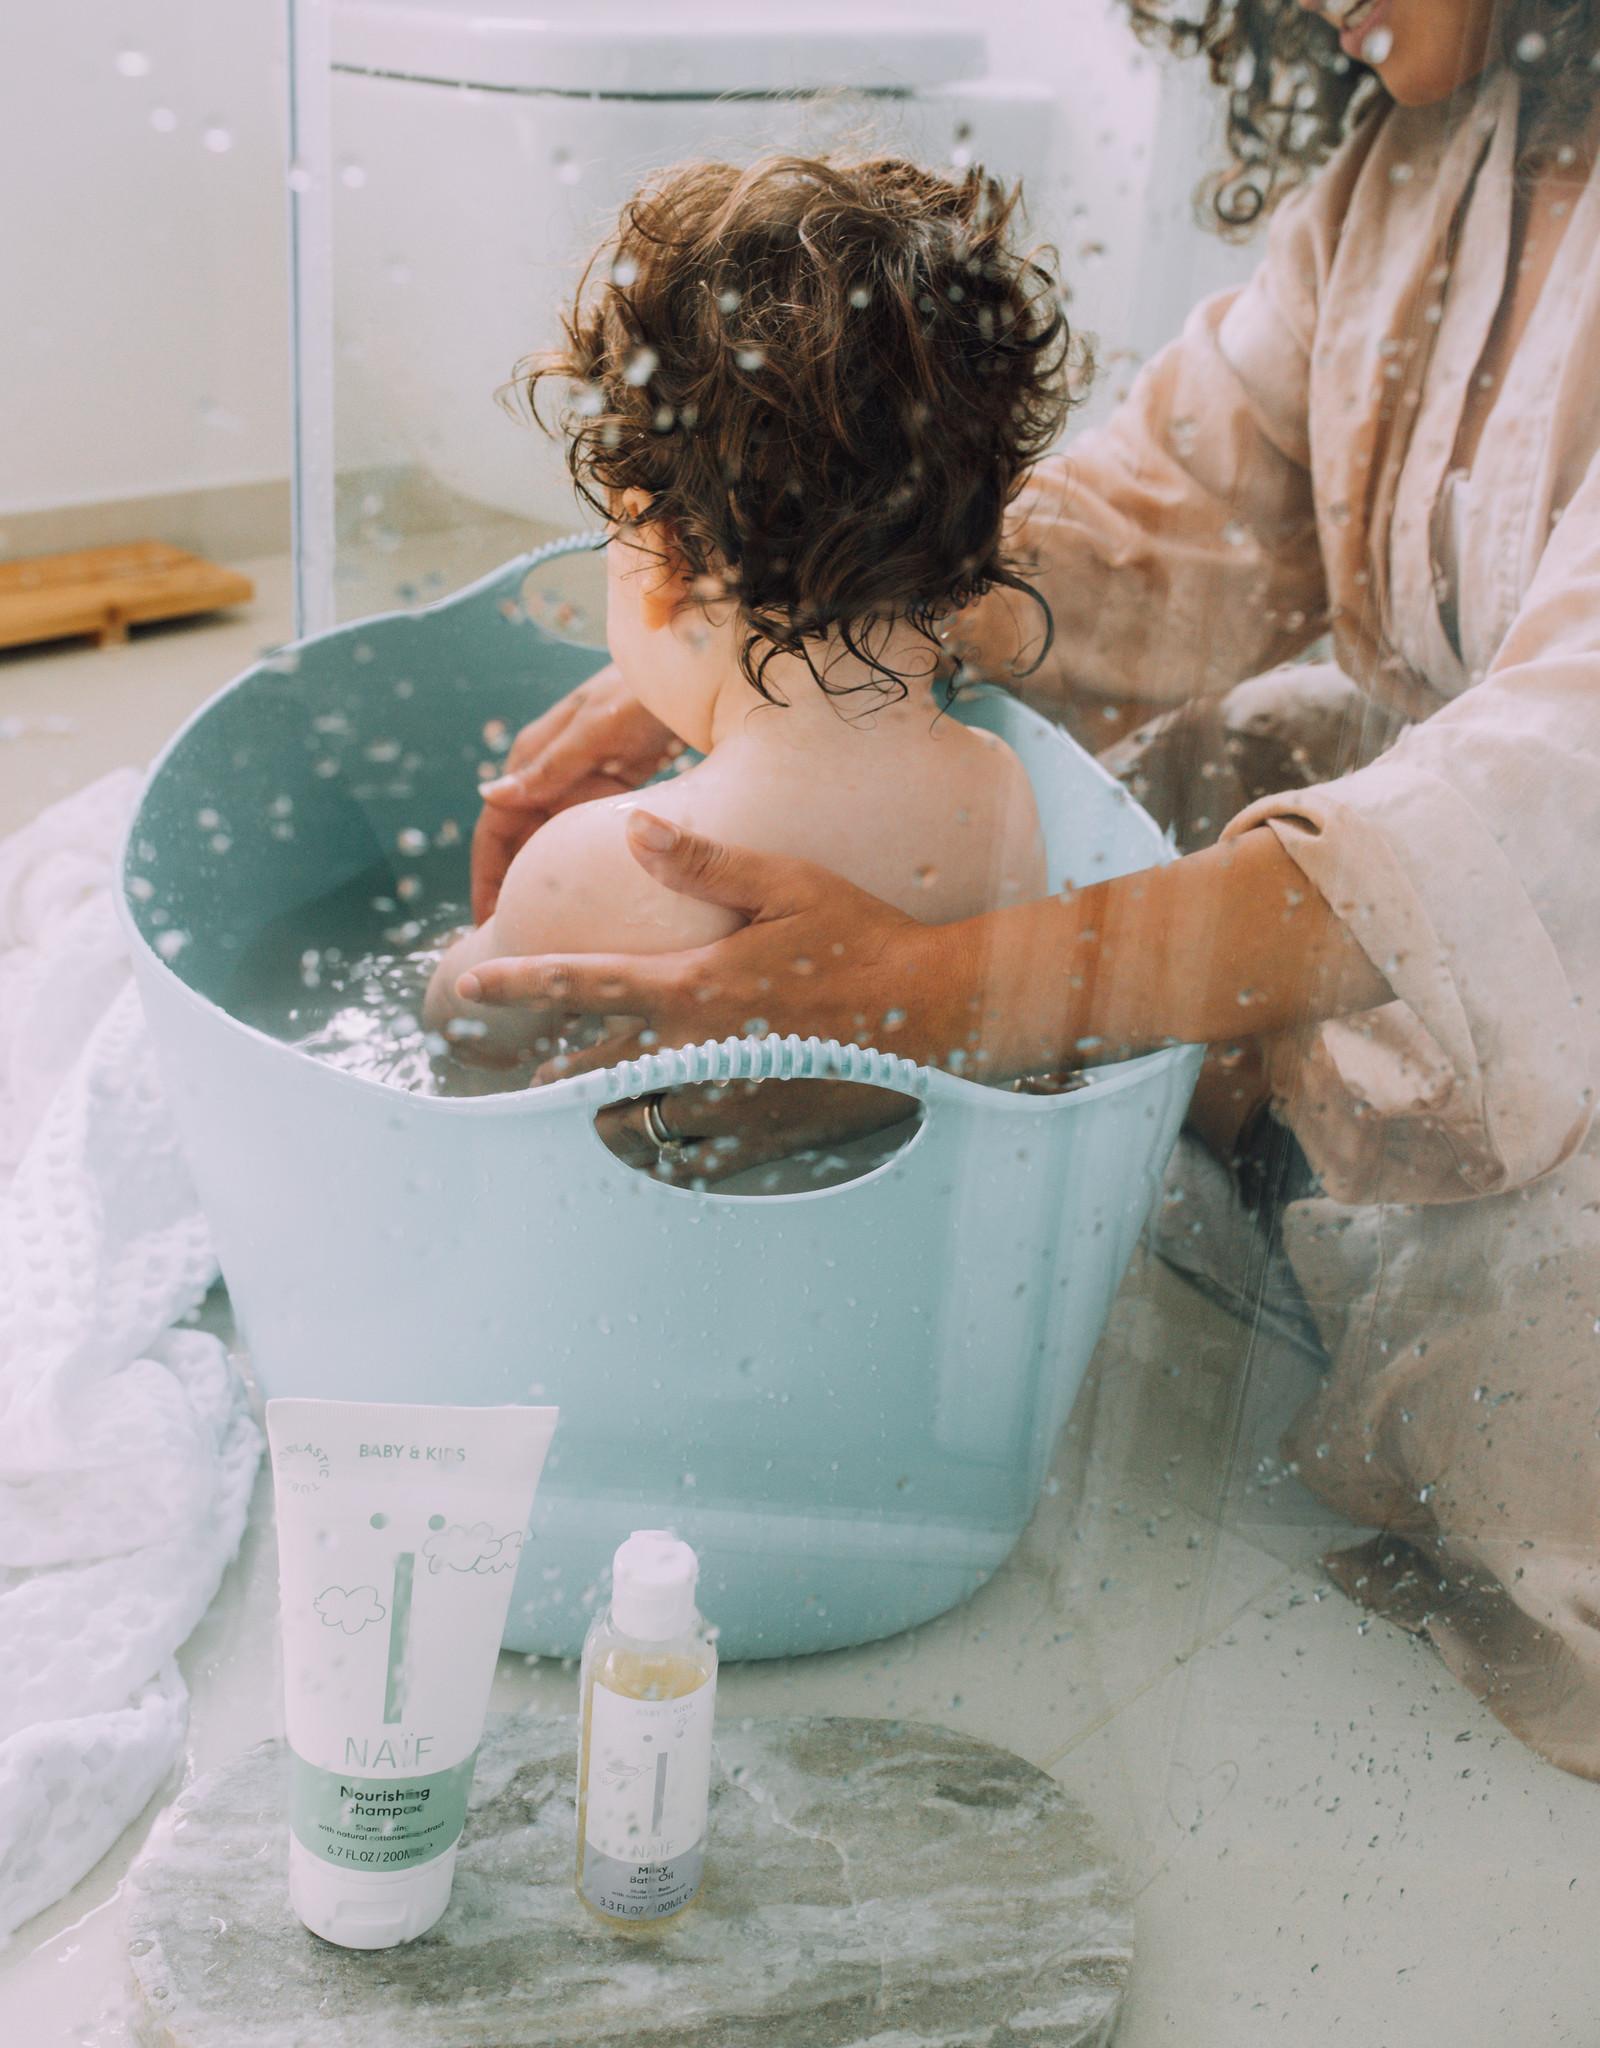 Naïf Naïf Bath Oil 100 ml